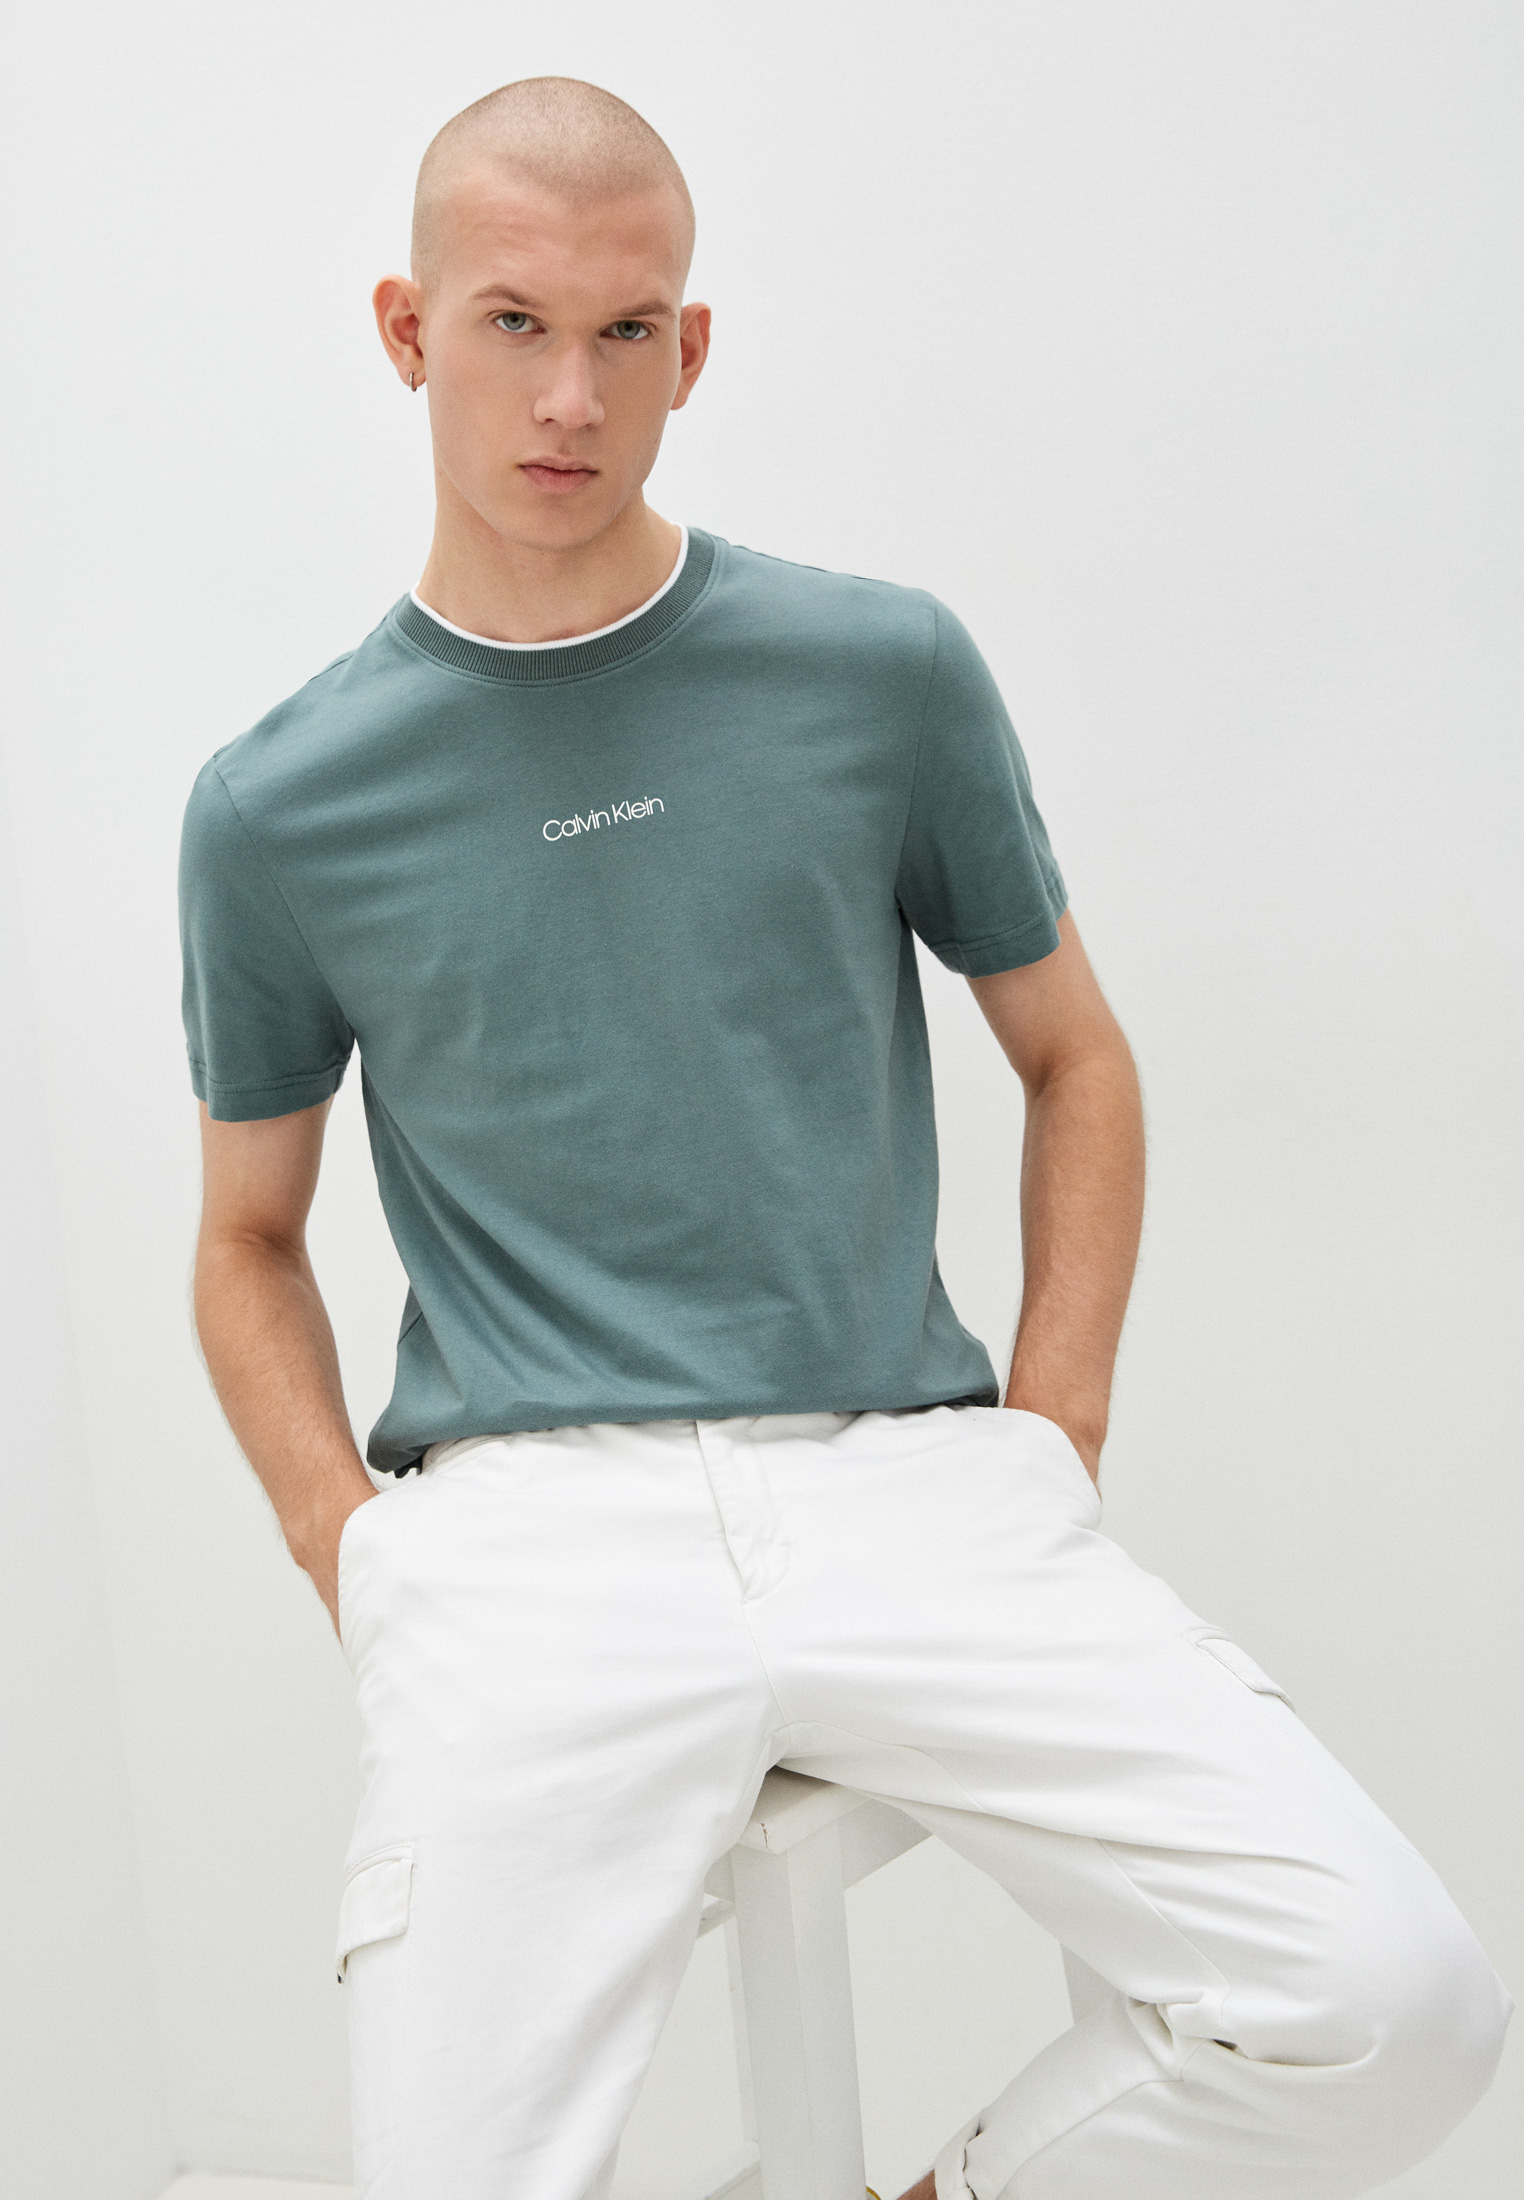 Мужская футболка Calvin Klein (Кельвин Кляйн) K10K107845